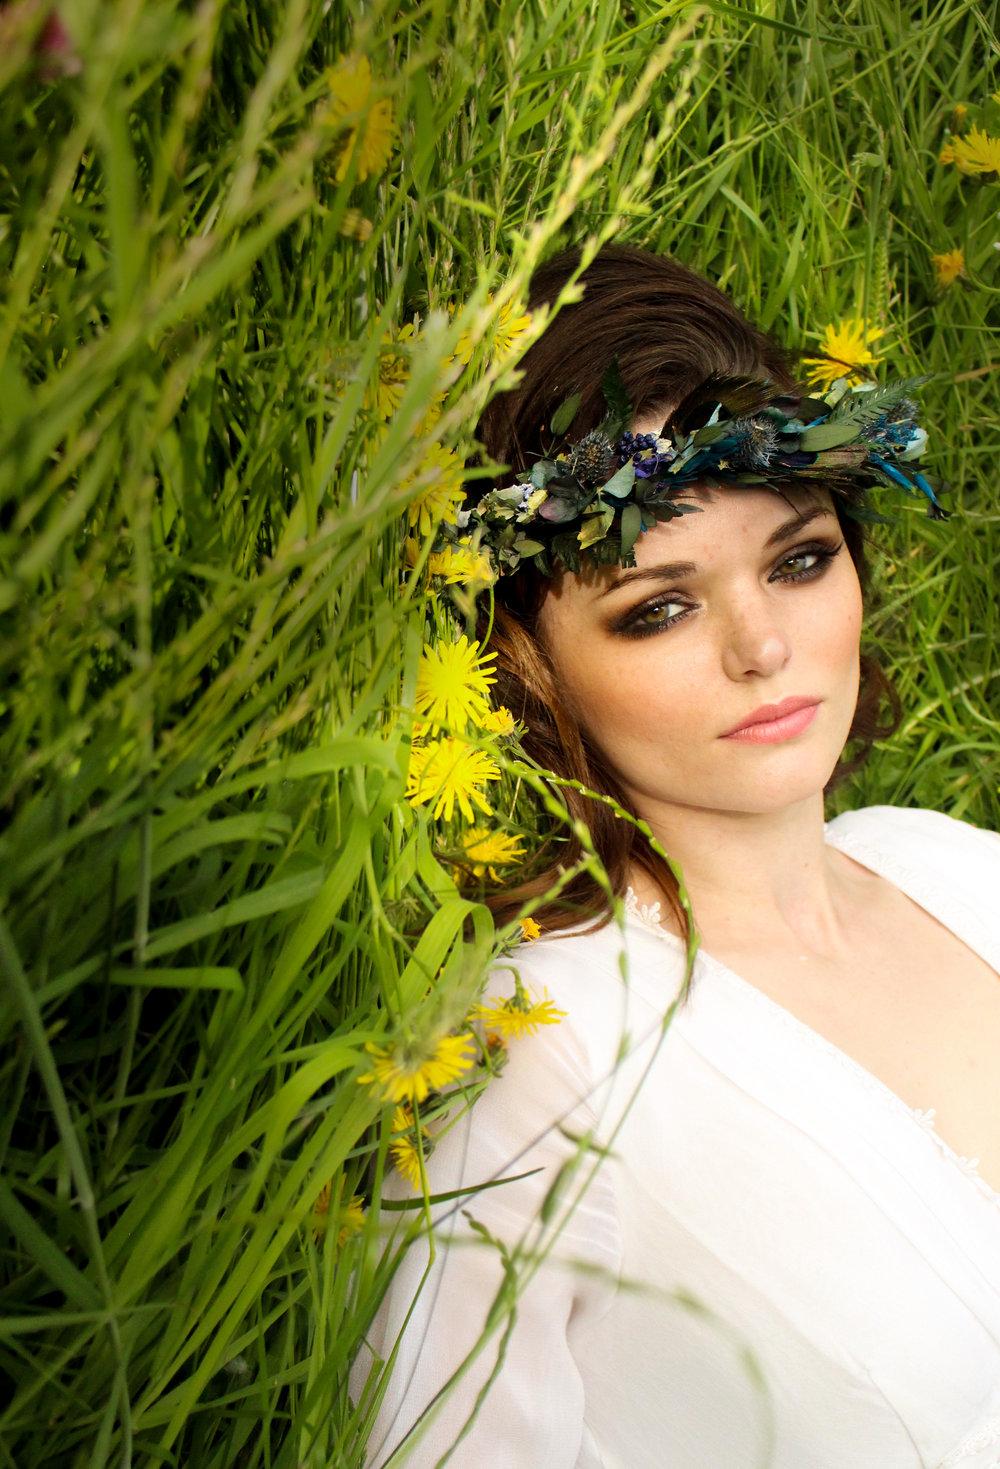 Photo/hair and makeup by Nicola Honey Artistry  Model - Jodi Lakin